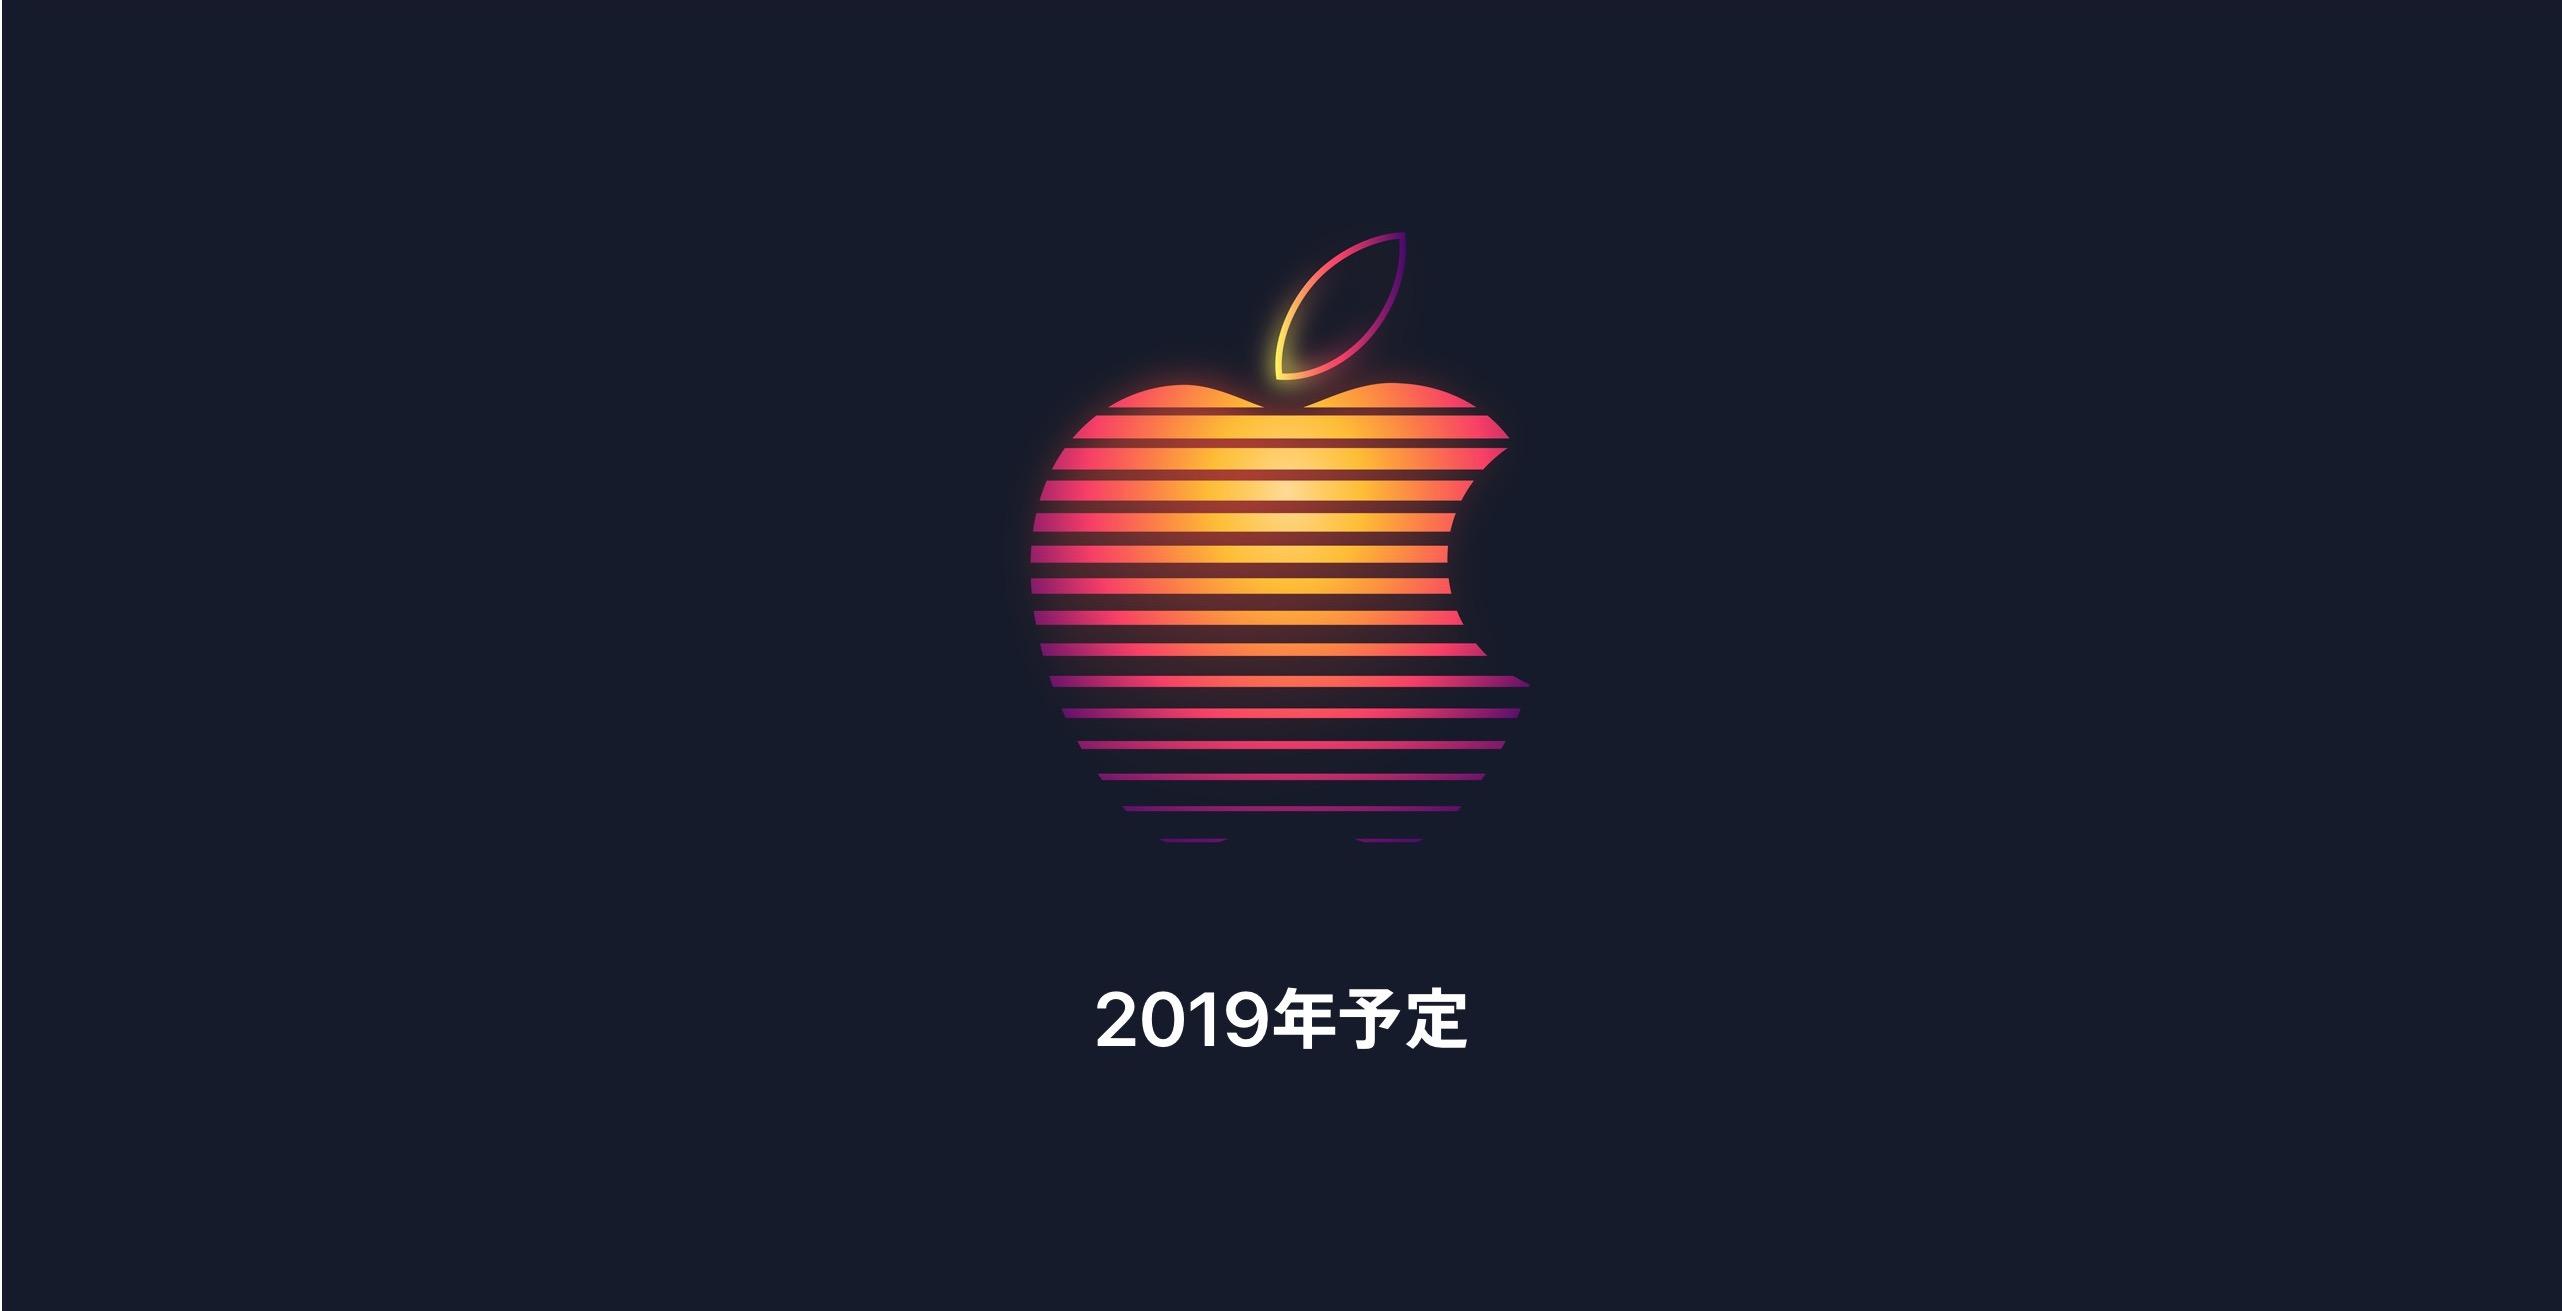 Apple福岡、9月下旬に移転オープン。年末にはもう1店舗